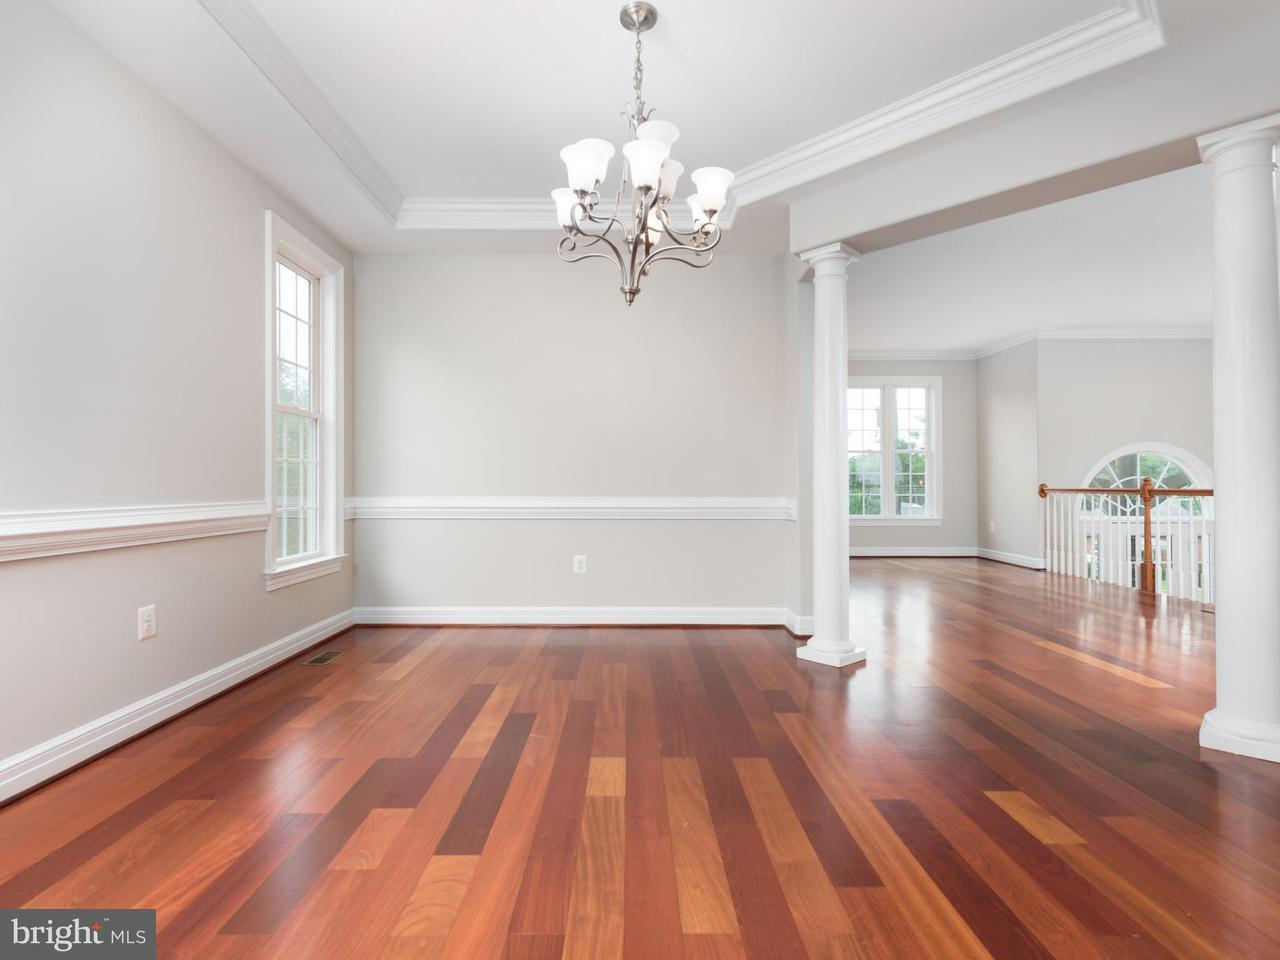 Additional photo for property listing at 1413 Payne Street 1413 Payne Street Fredericksburg, バージニア 22401 アメリカ合衆国